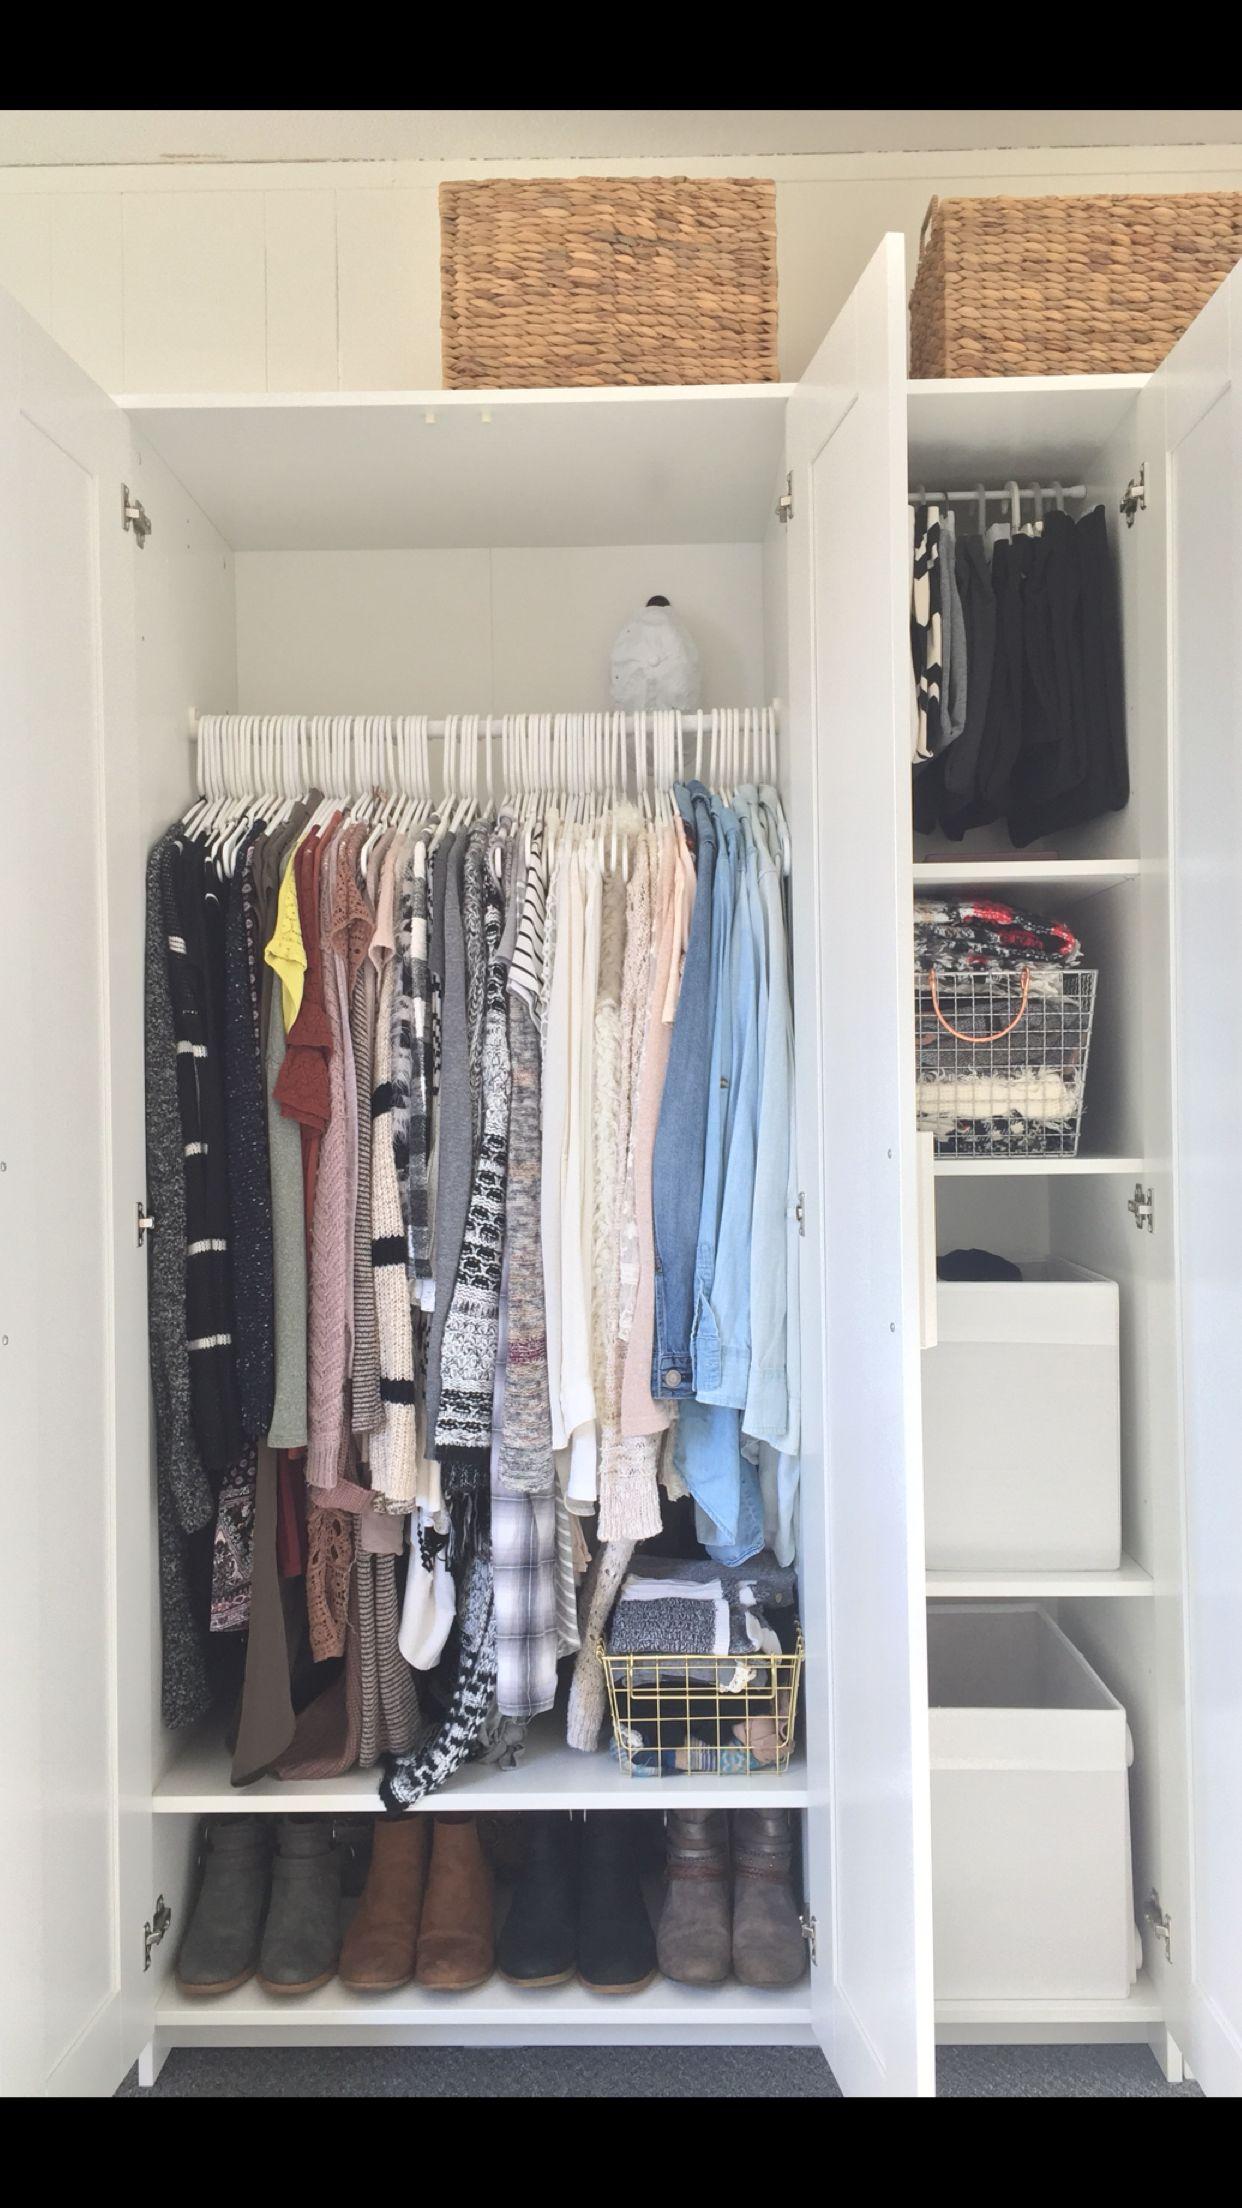 Brimnes Wardrobe IKEA | Brimnes wardrobe, Ikea wardrobe